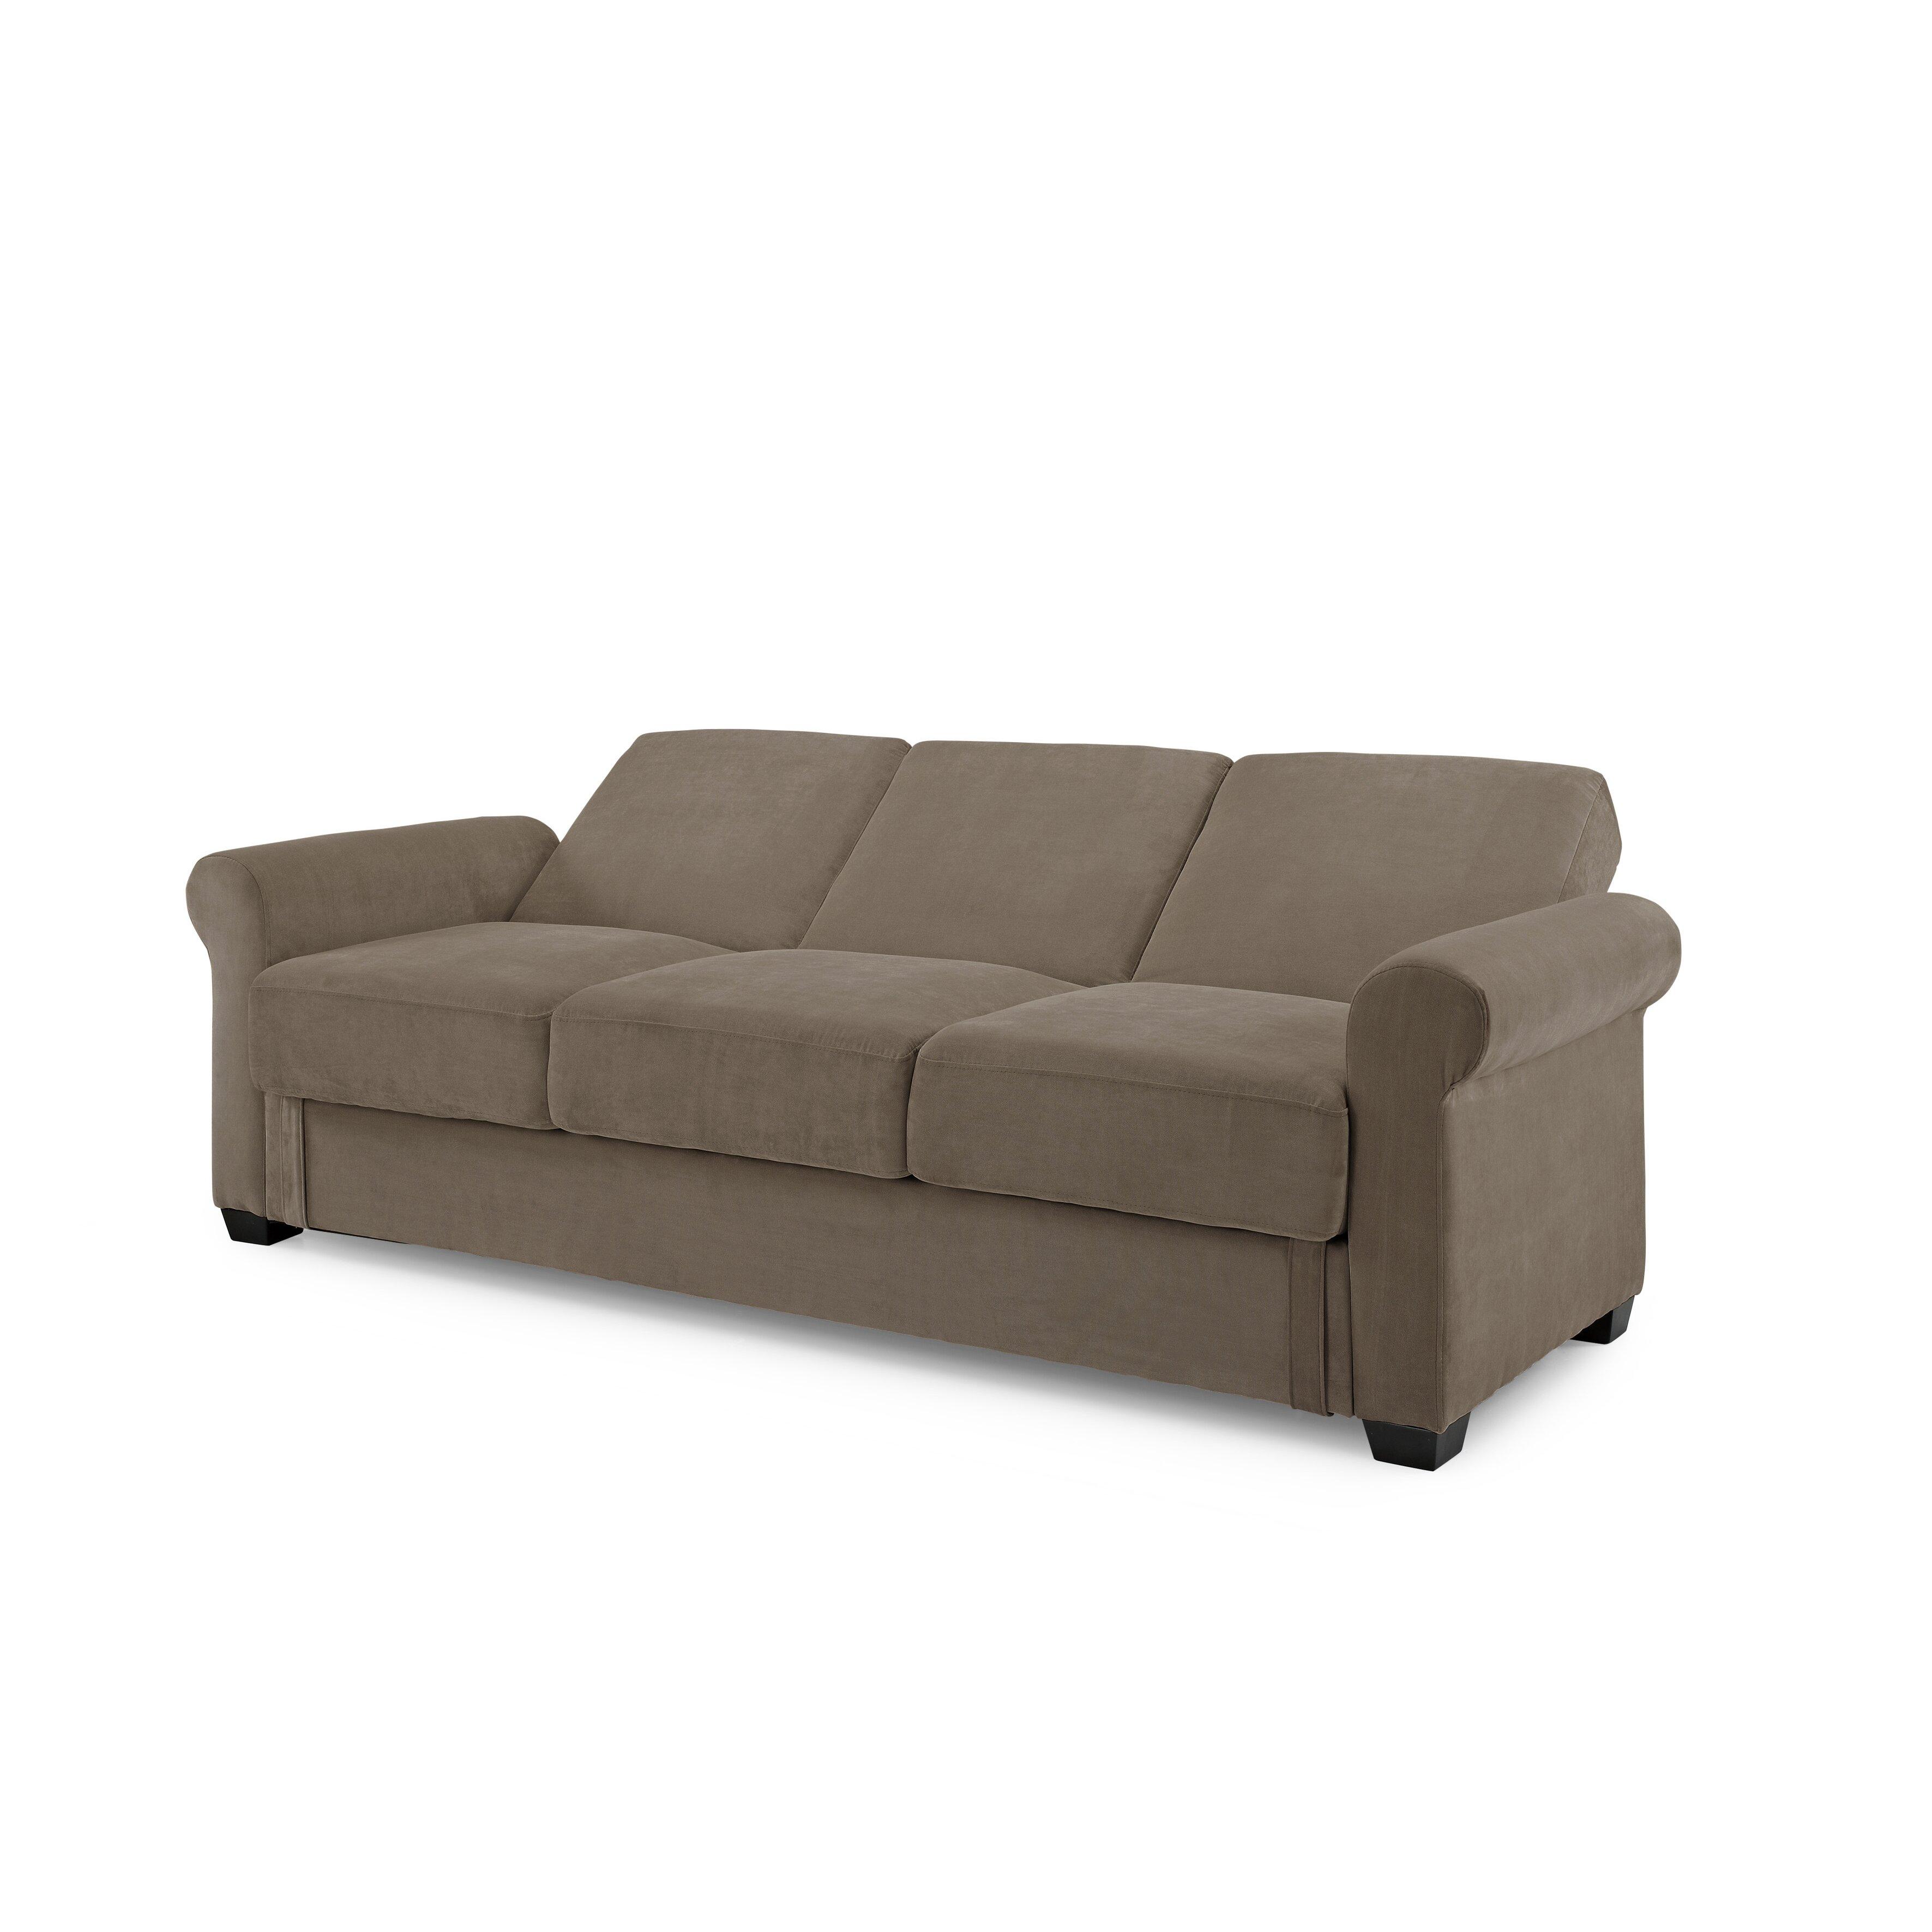 lifestyle solutions serta dream thomas sleeper sofa reviews wayfair. Black Bedroom Furniture Sets. Home Design Ideas